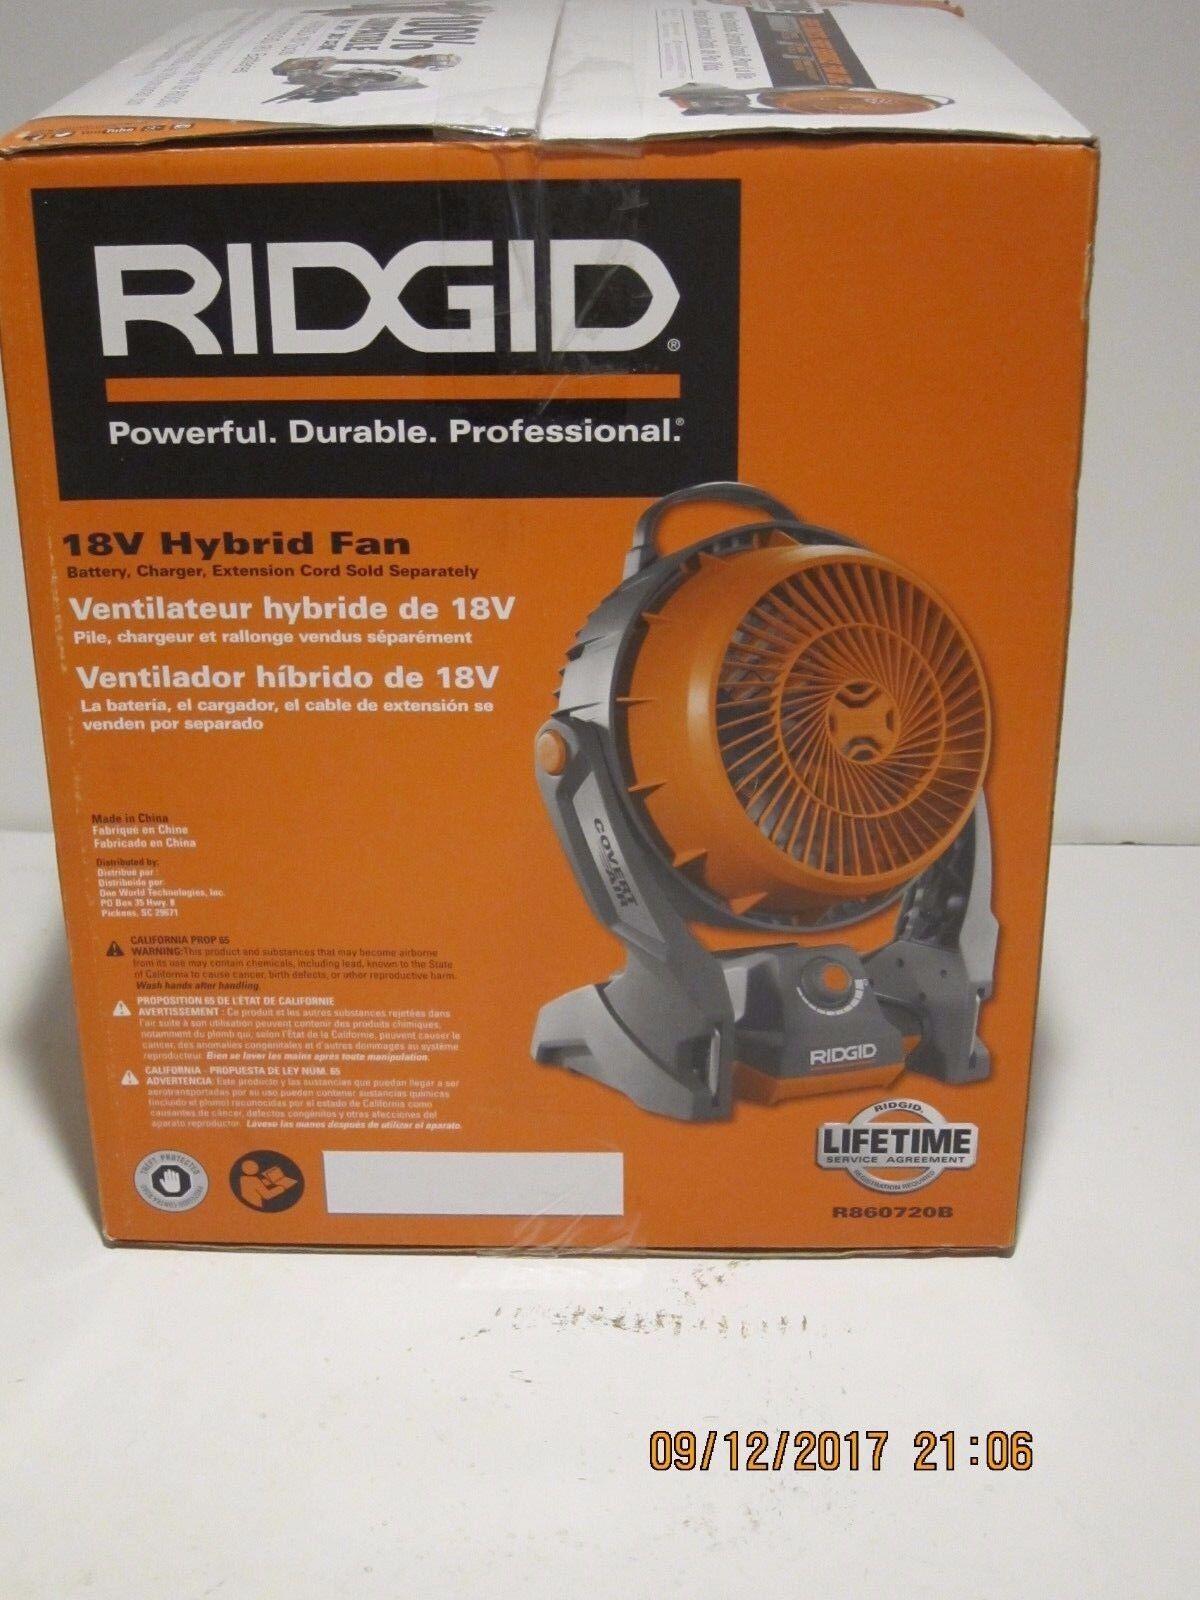 RIDGID R860720B GEN5X Hybrid Fan 18-Volt Rubber Handle Variable Speed Dials NISB